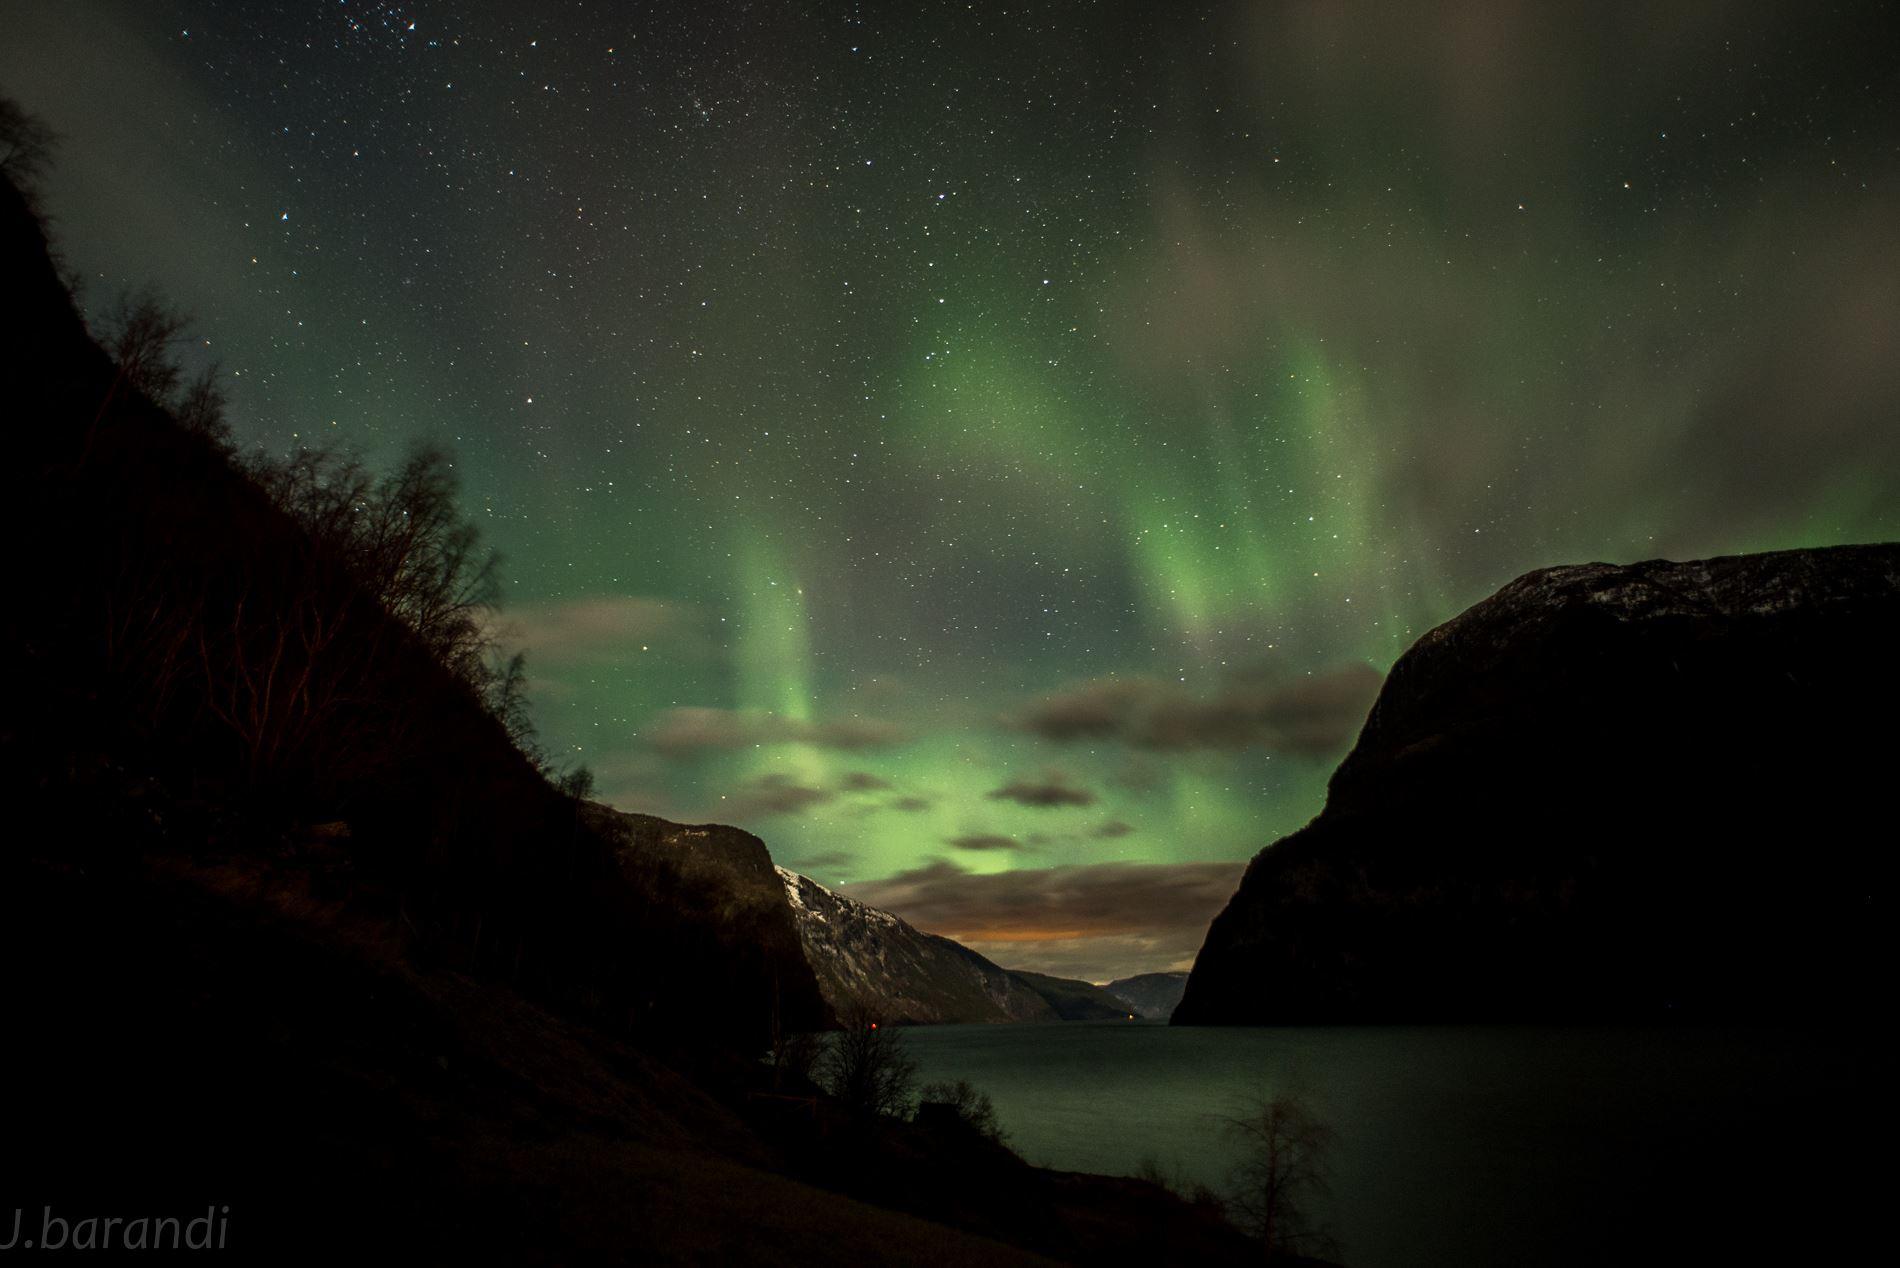 Josu Barandiaran, The Fjord Village Tour